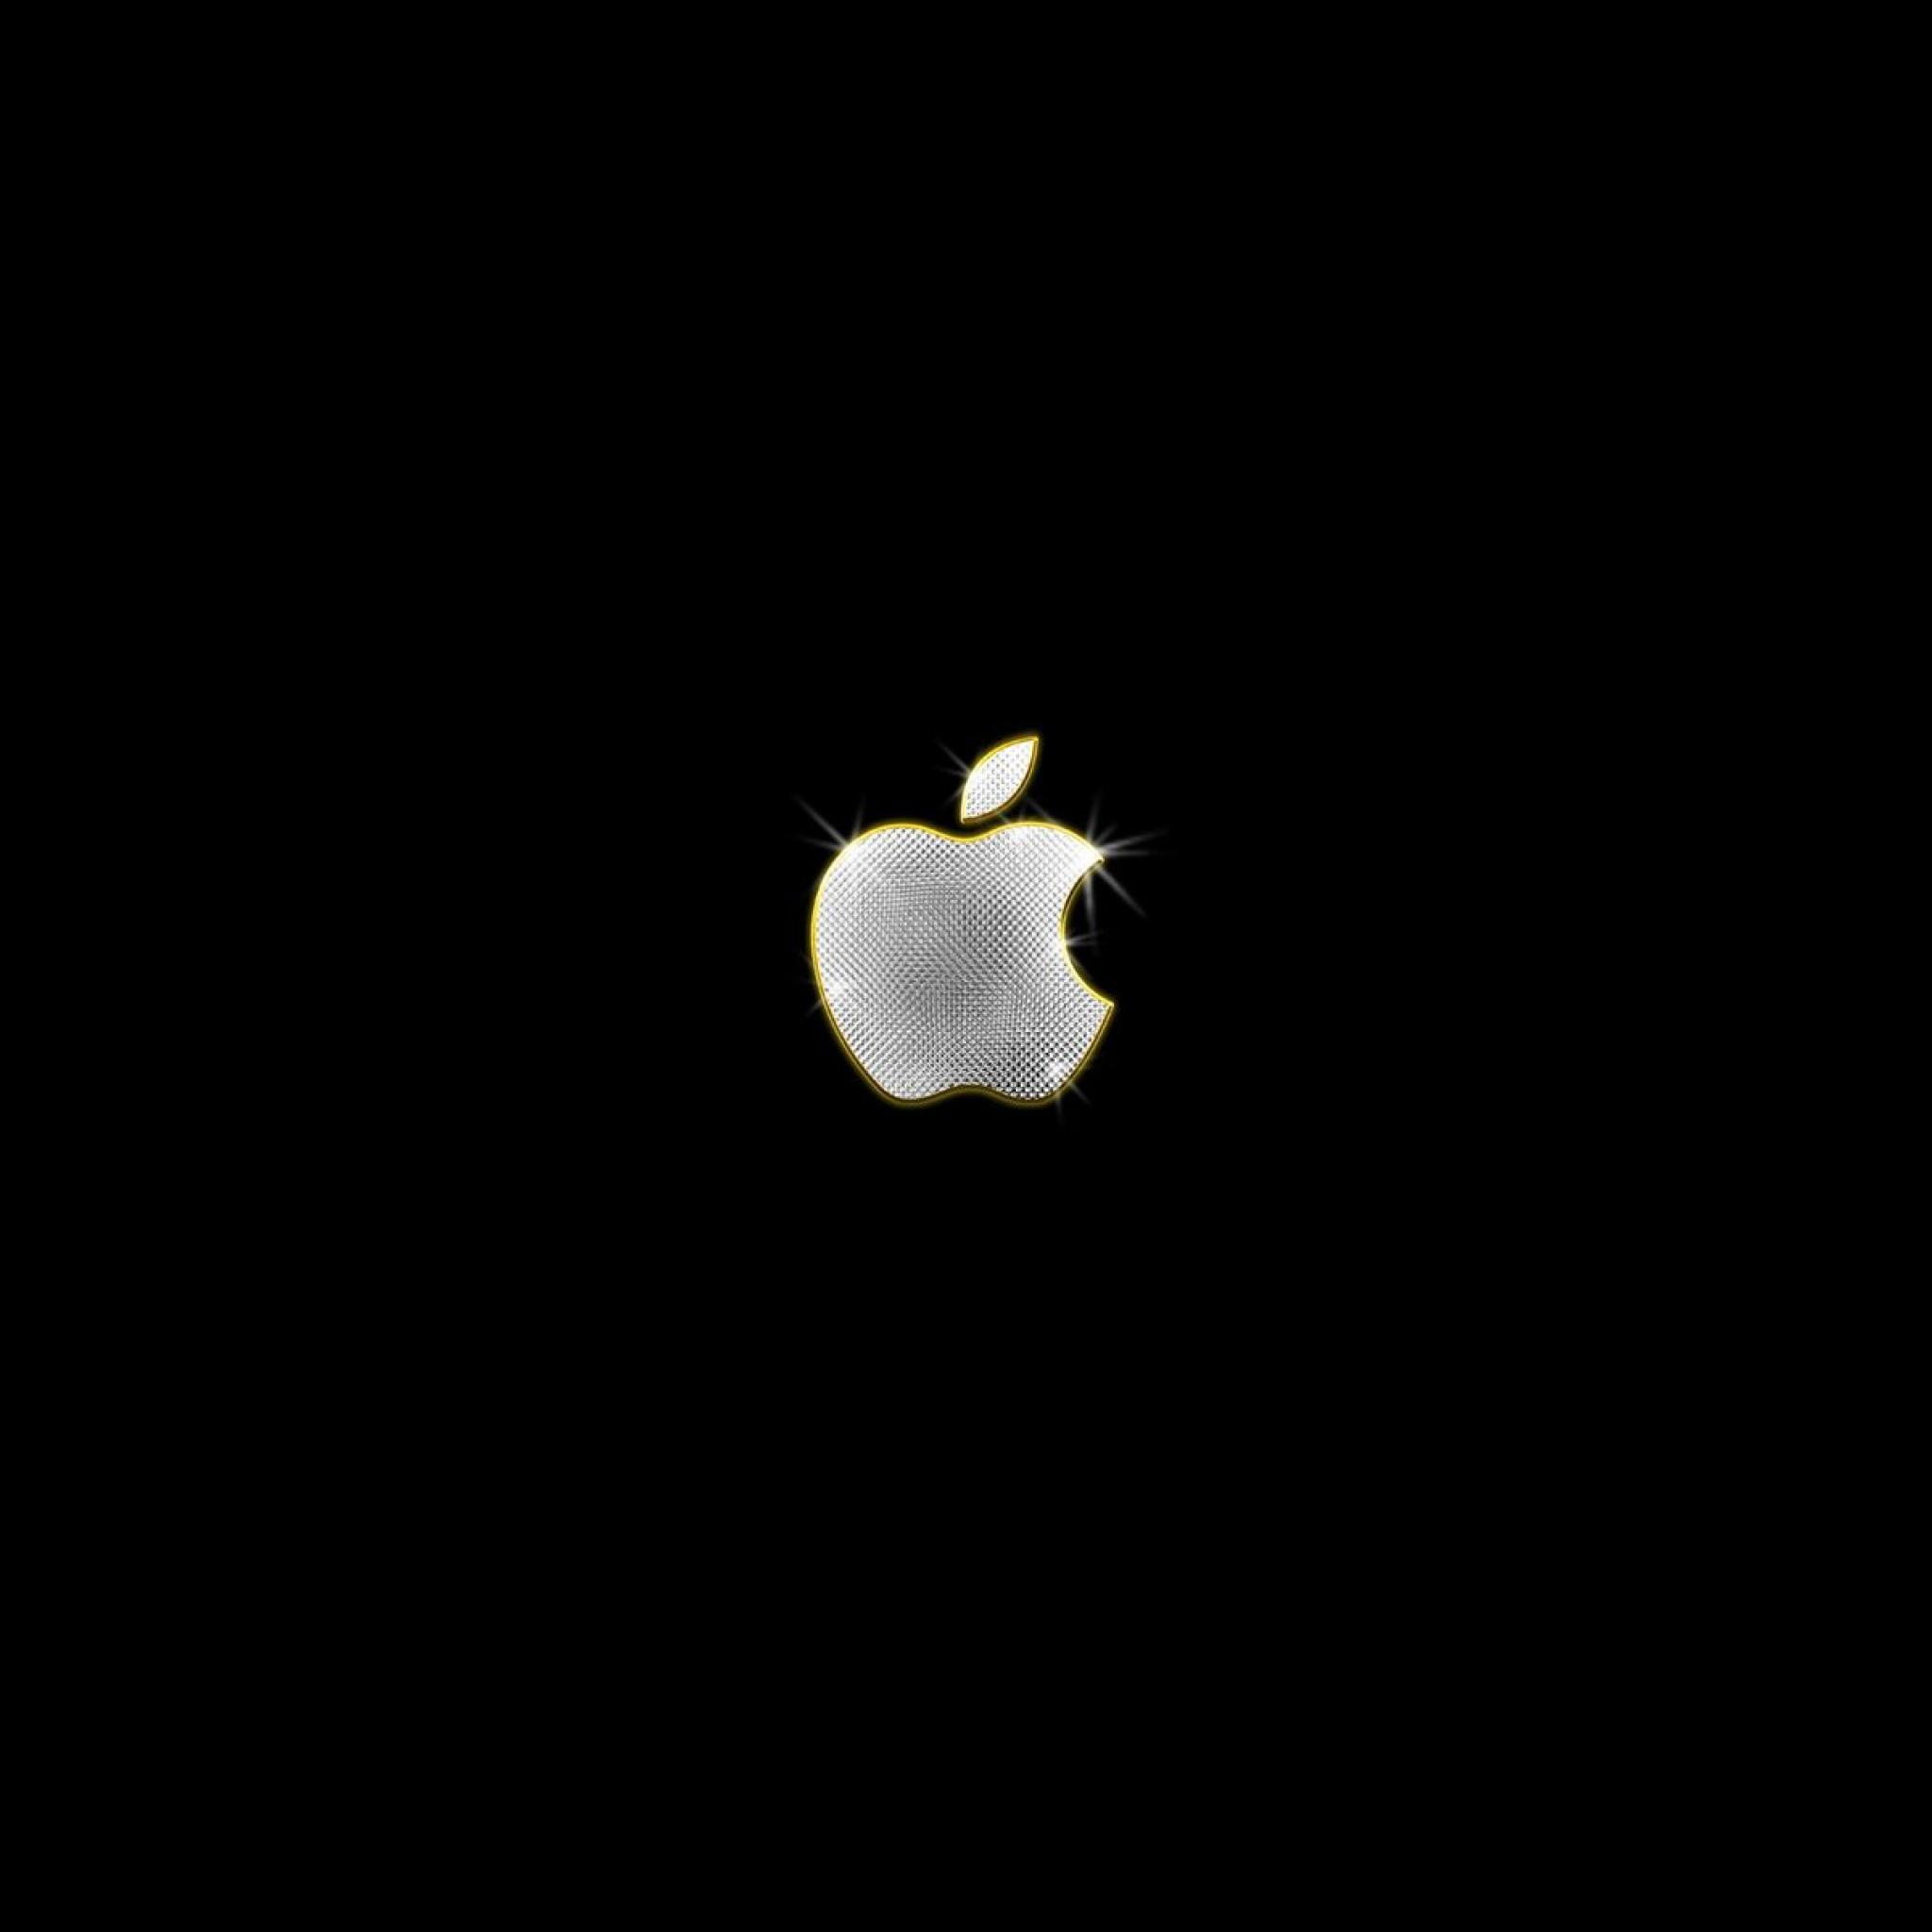 Apple Computer 3Wallpapers iPad Retina Apple Diamonds   iPad Retina